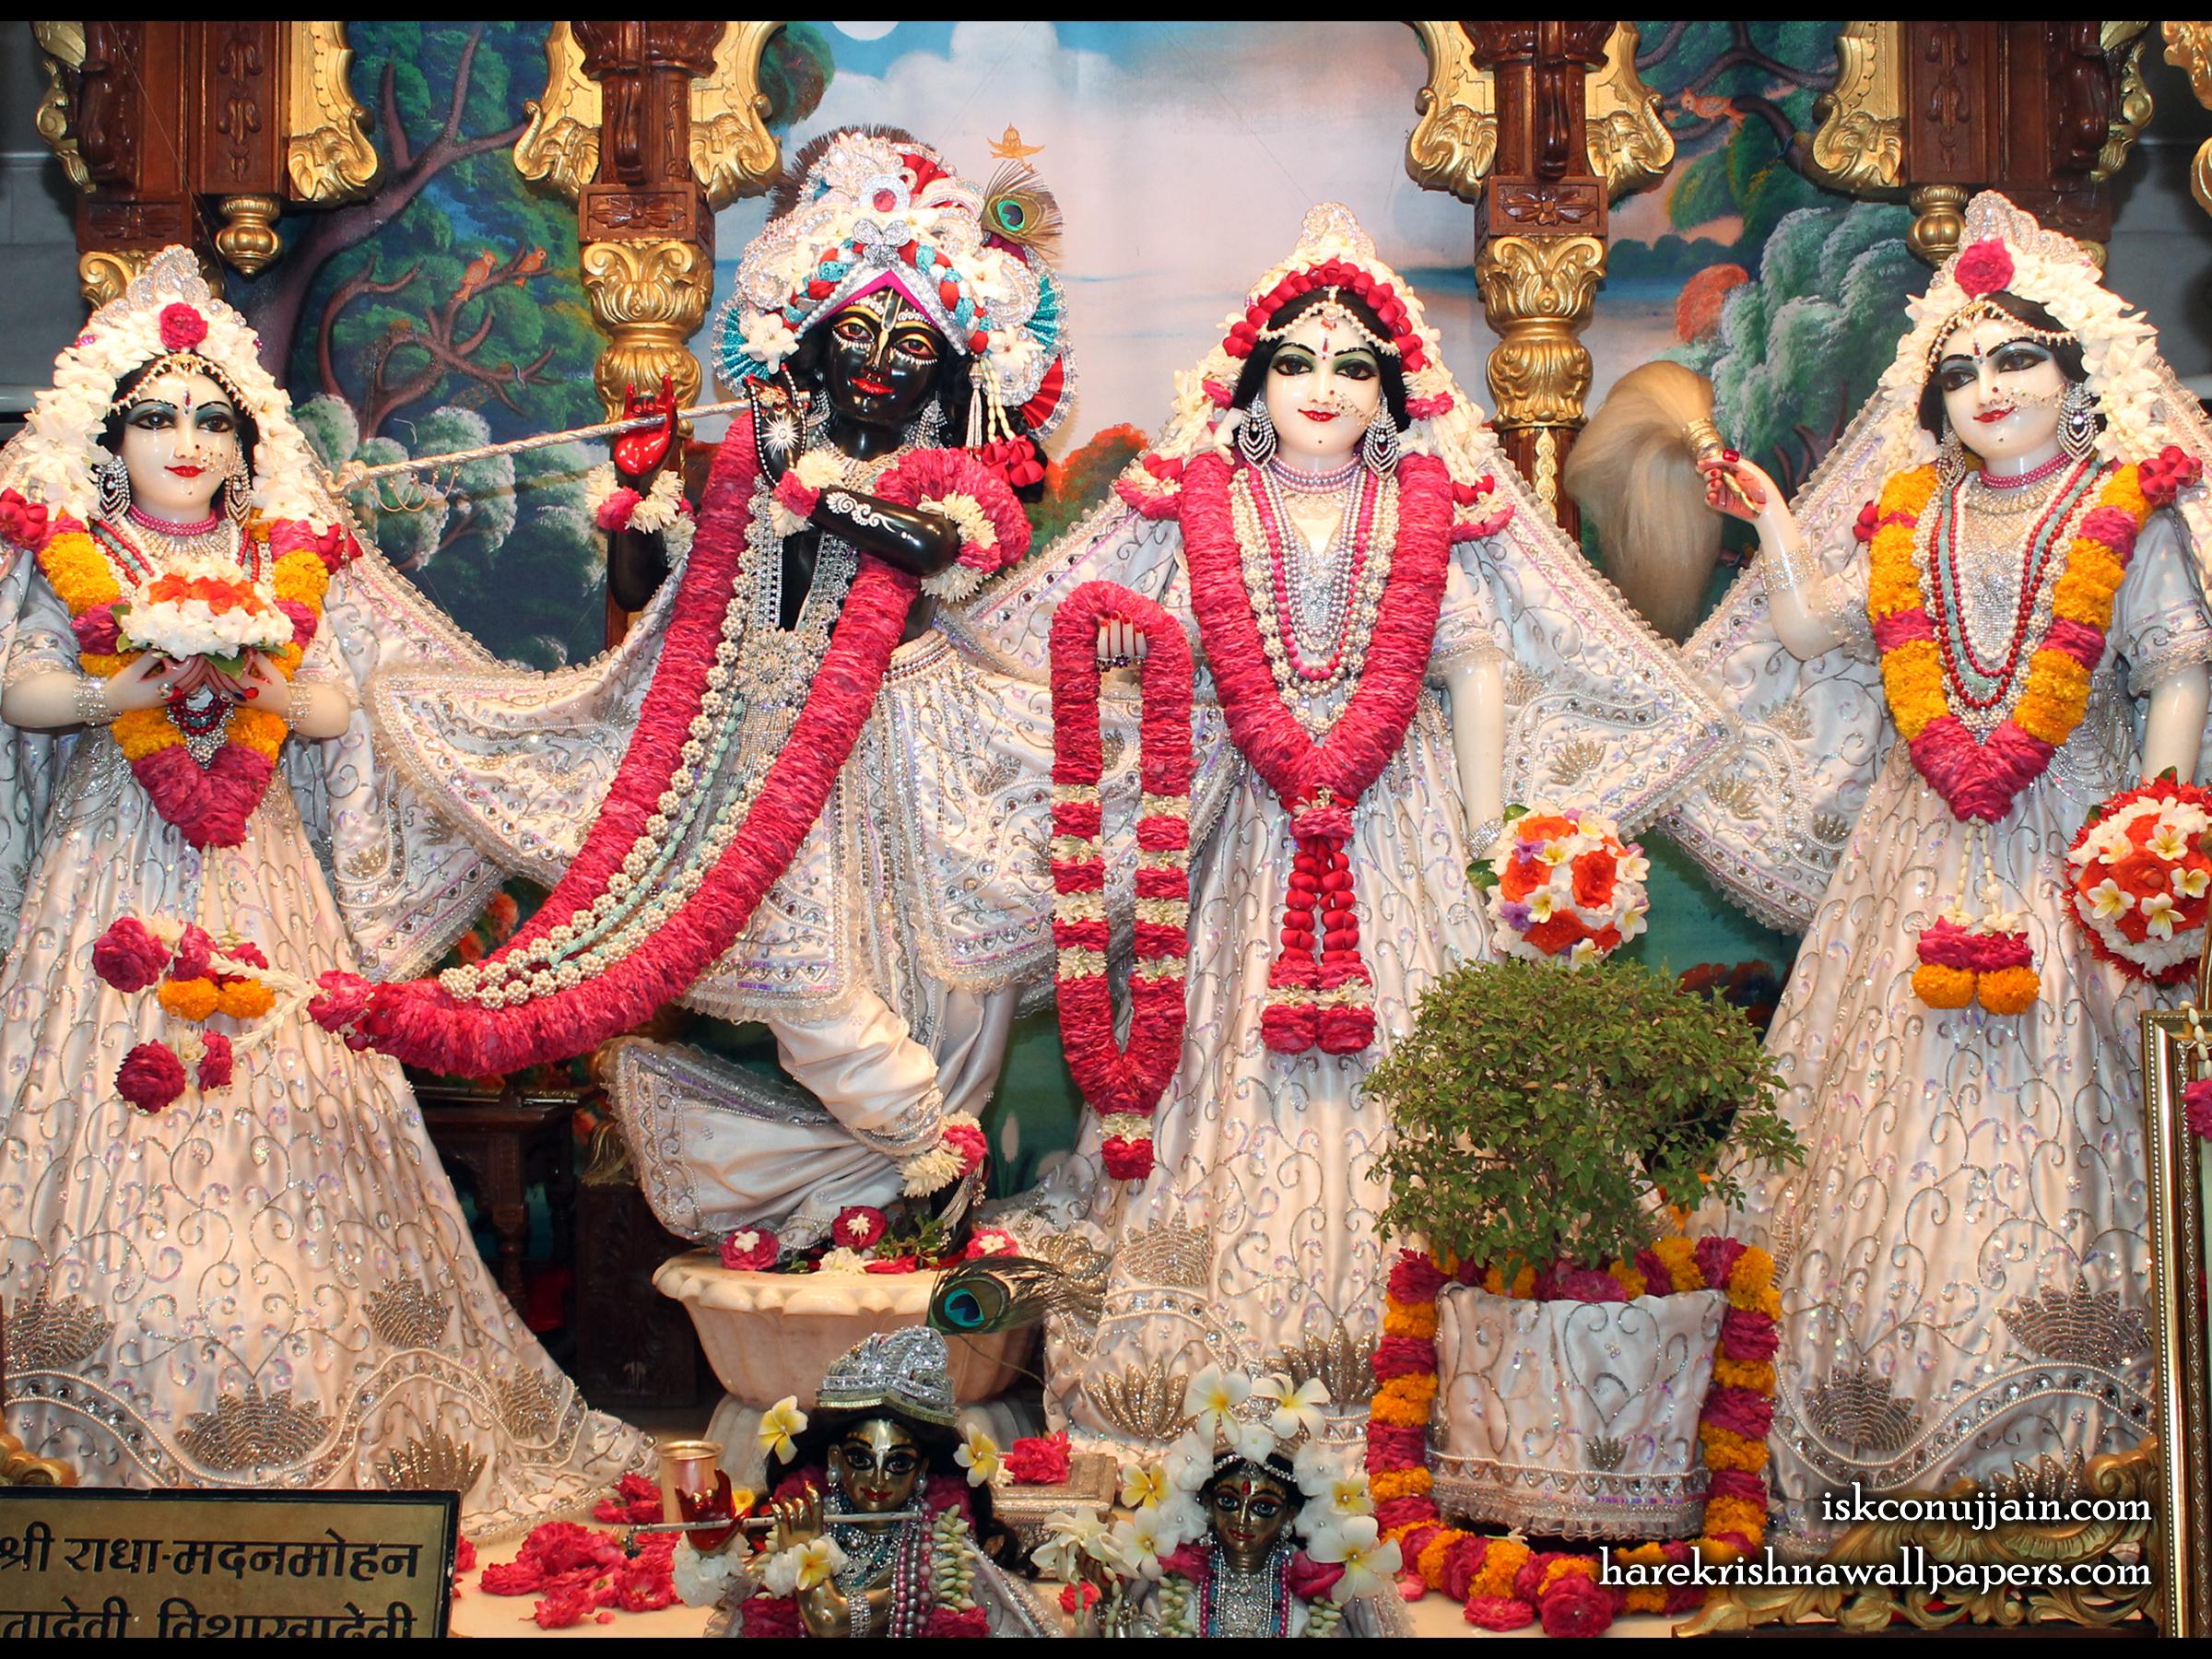 Sri Sri Radha Madanmohan Lalita Vishakha Wallpaper (005) Size 2400x1800 Download